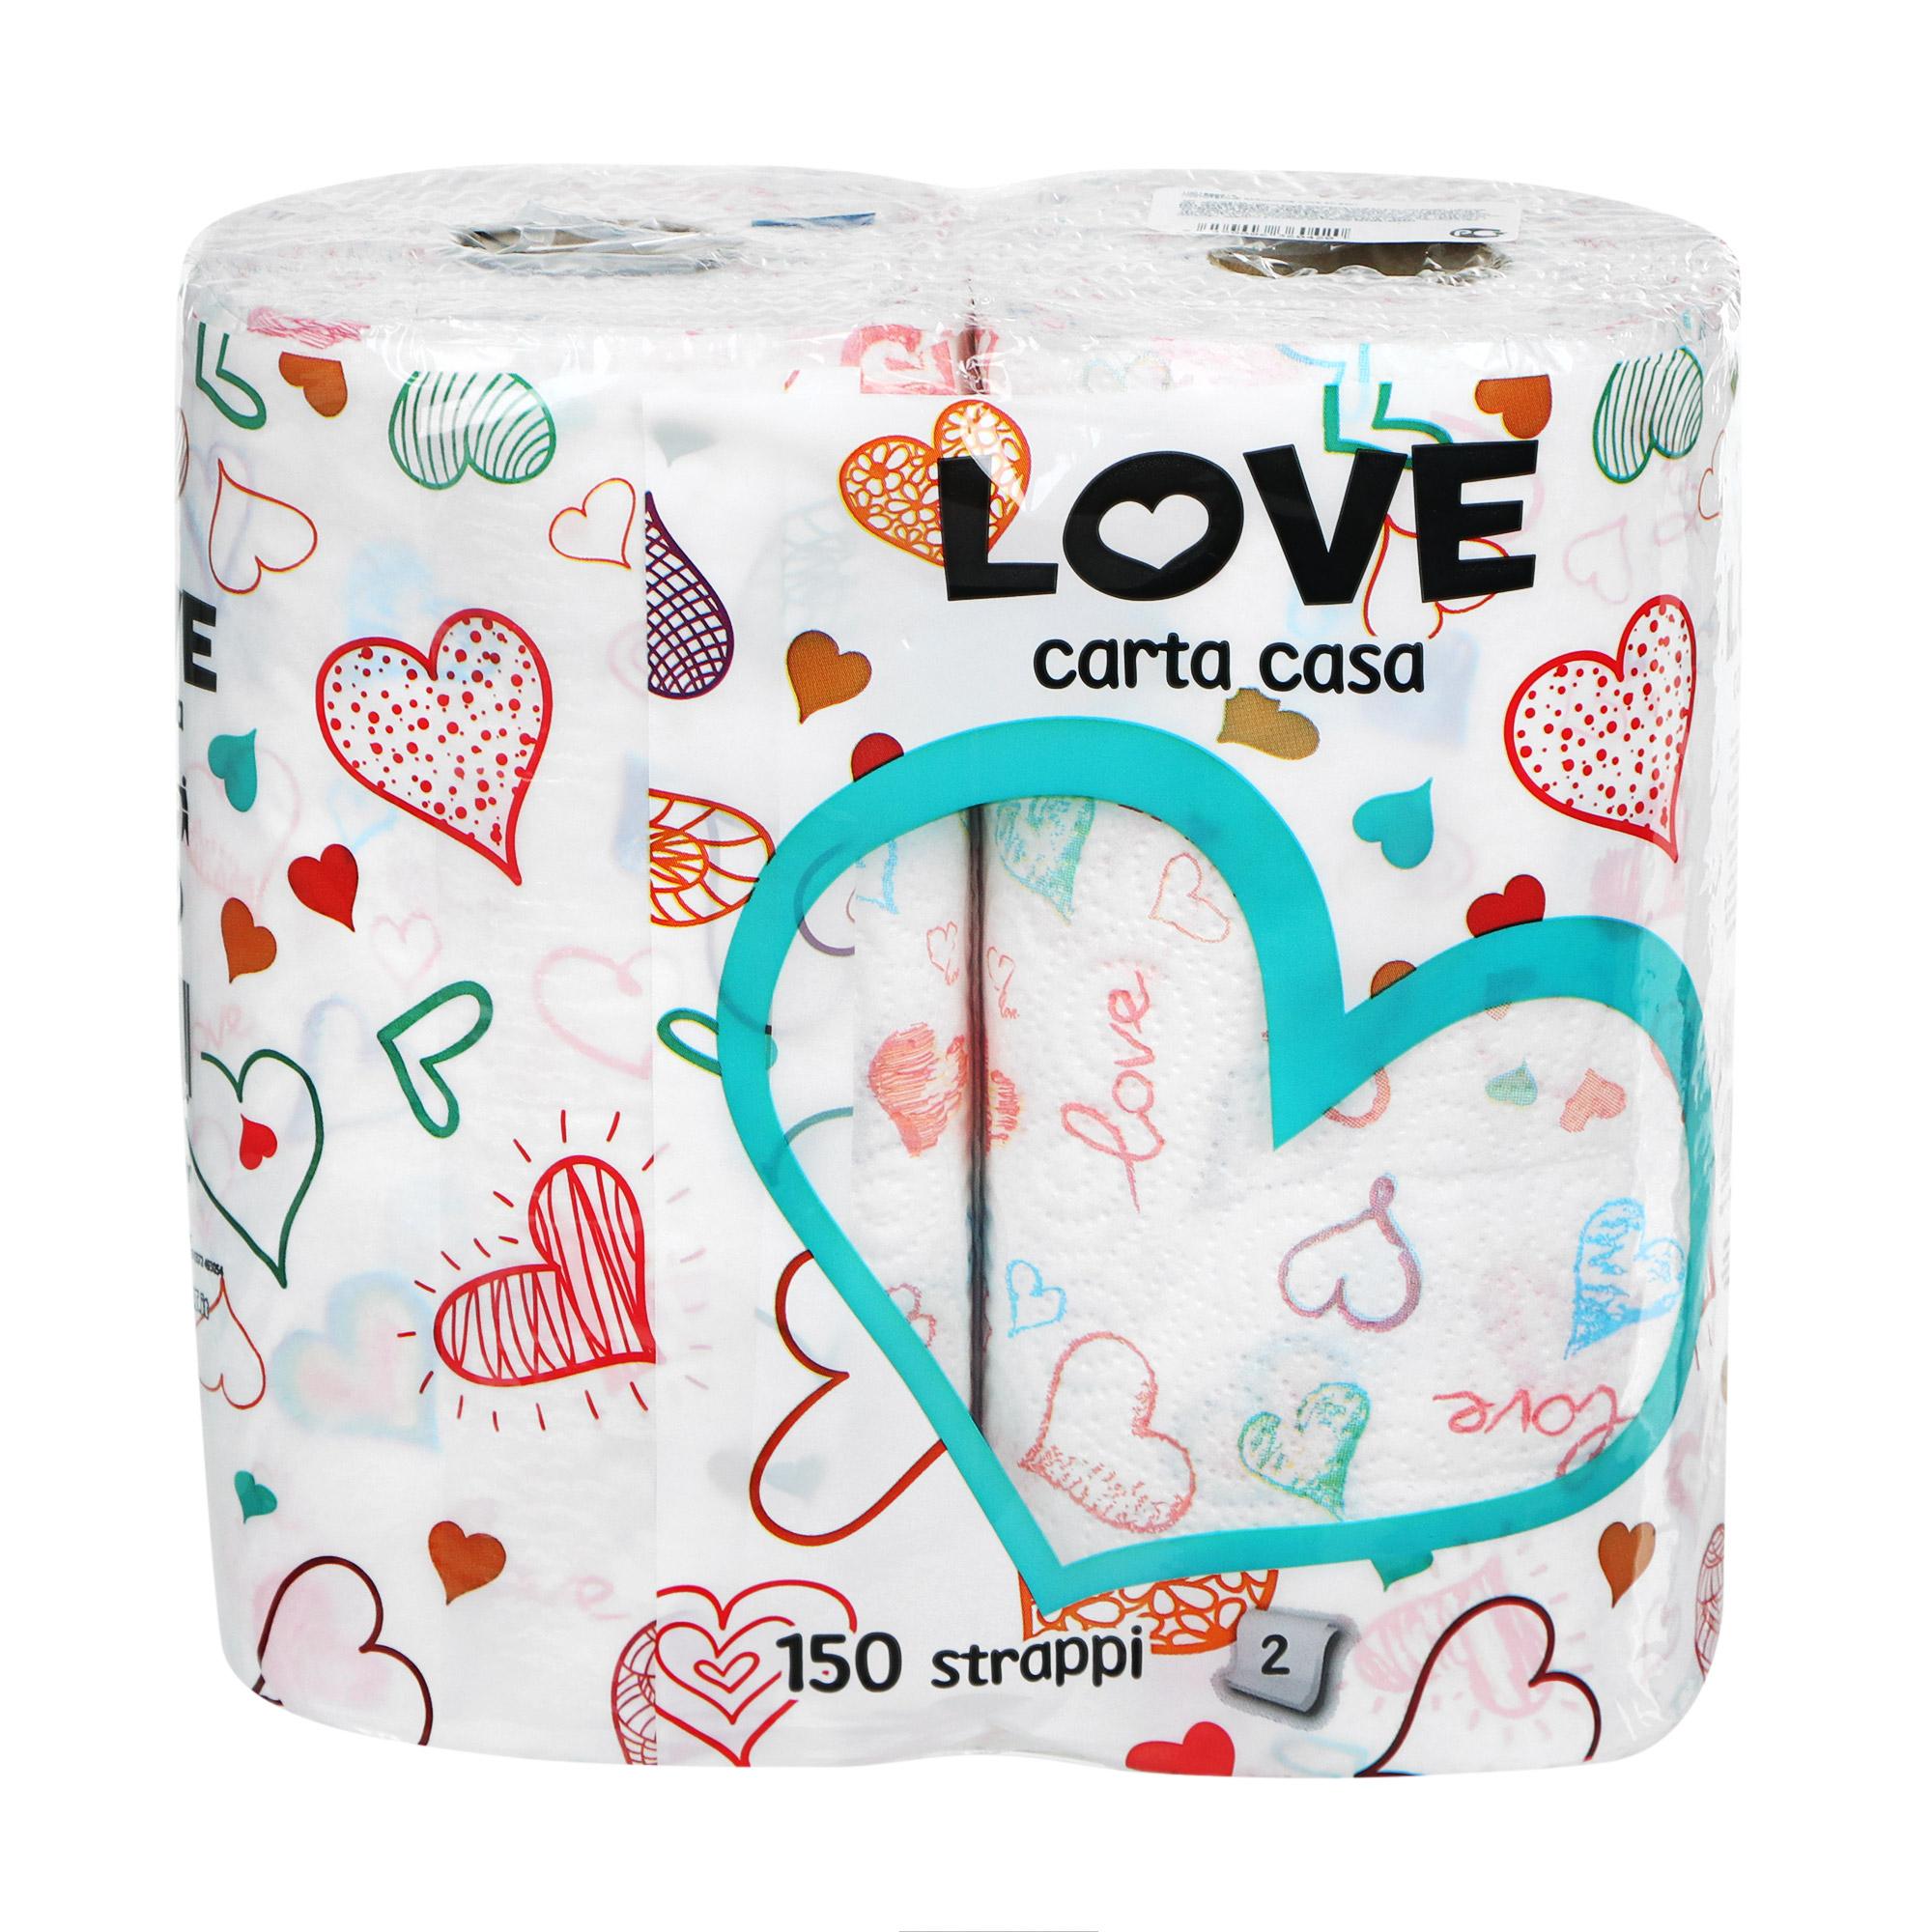 Полотенце кухонное World cart love 2 руллона слоя